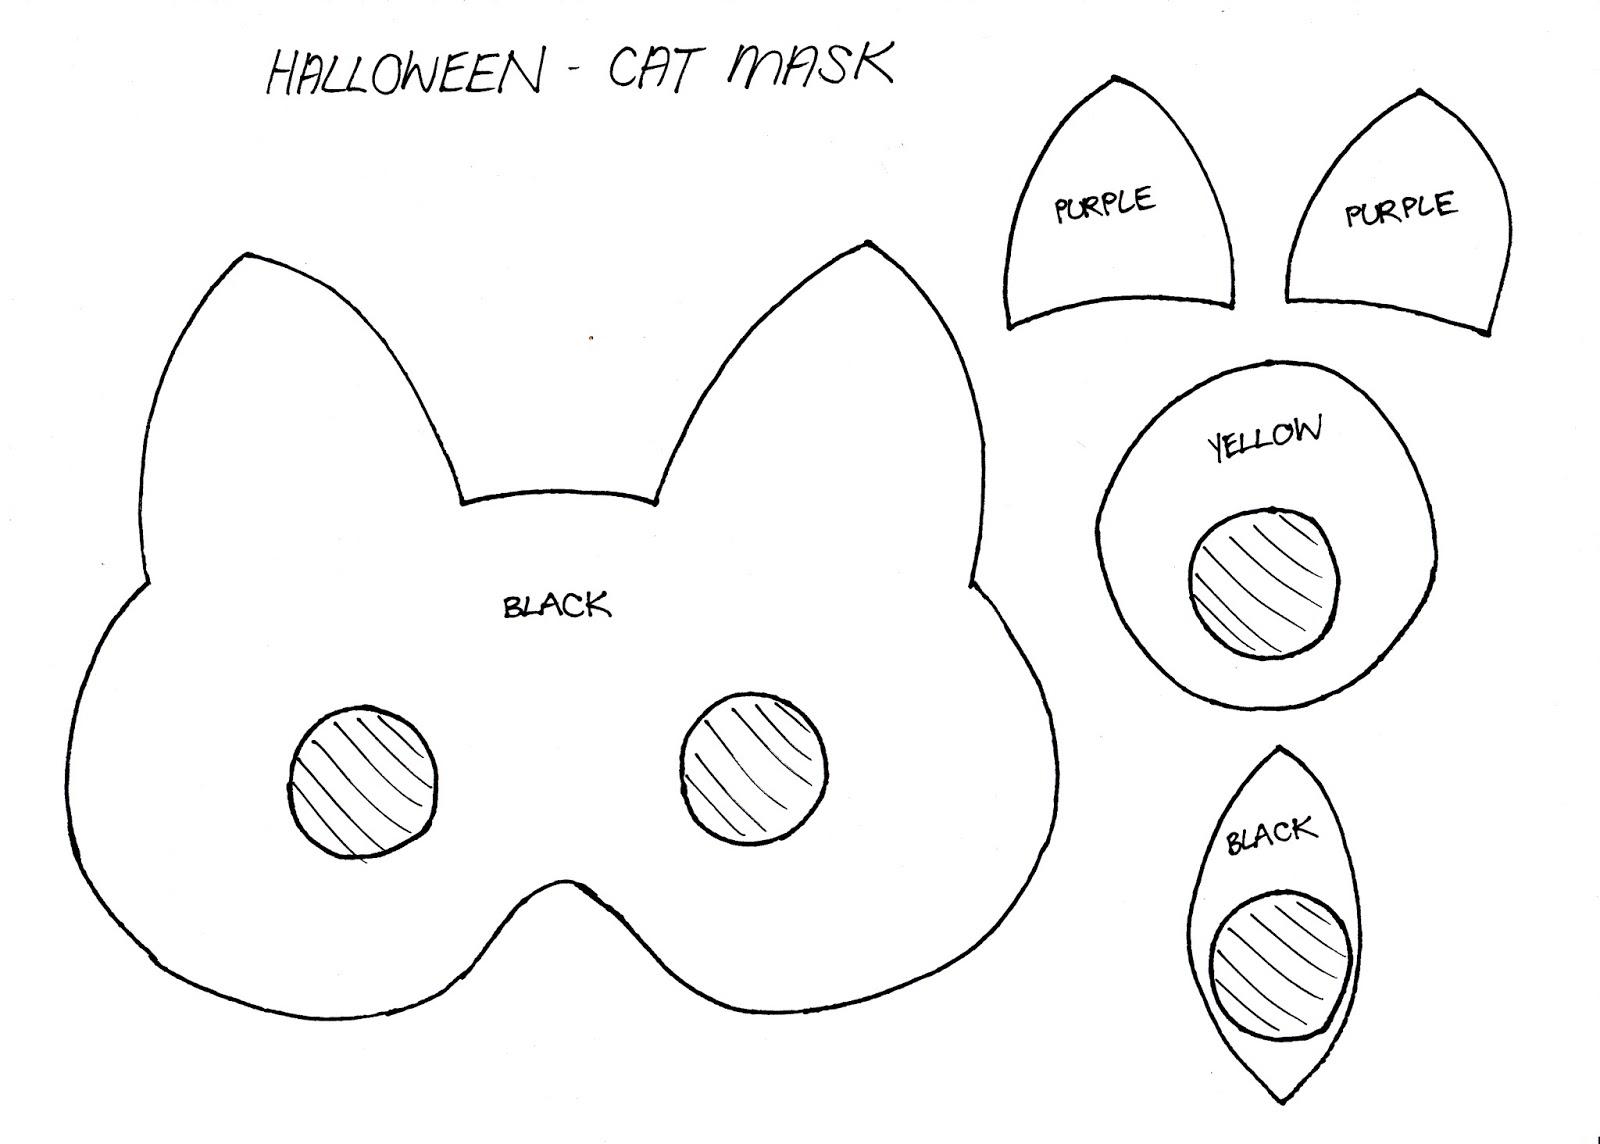 Diy party costume mask black cat kitten template printable - Filename Halloween Mask Cat_0001 Jpg